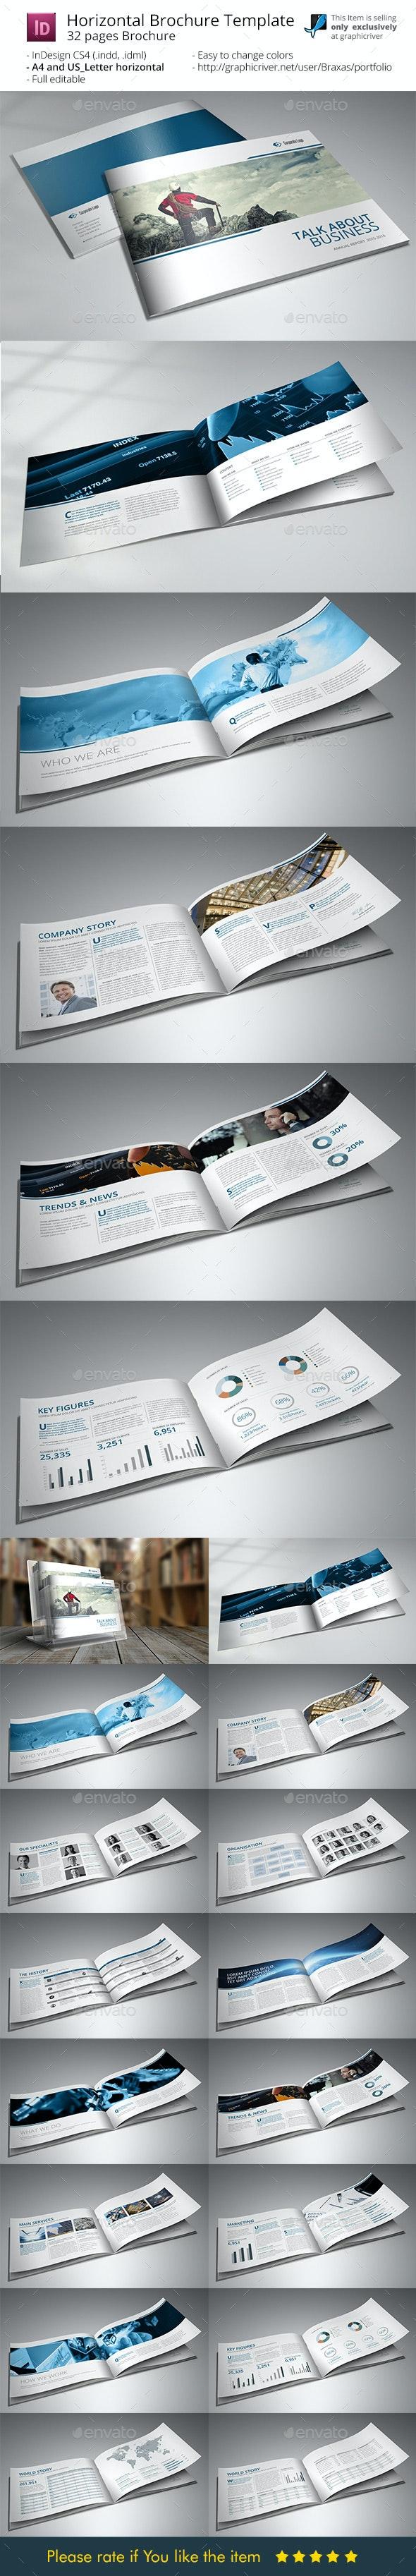 Business Brochure Printing Template - Informational Brochures